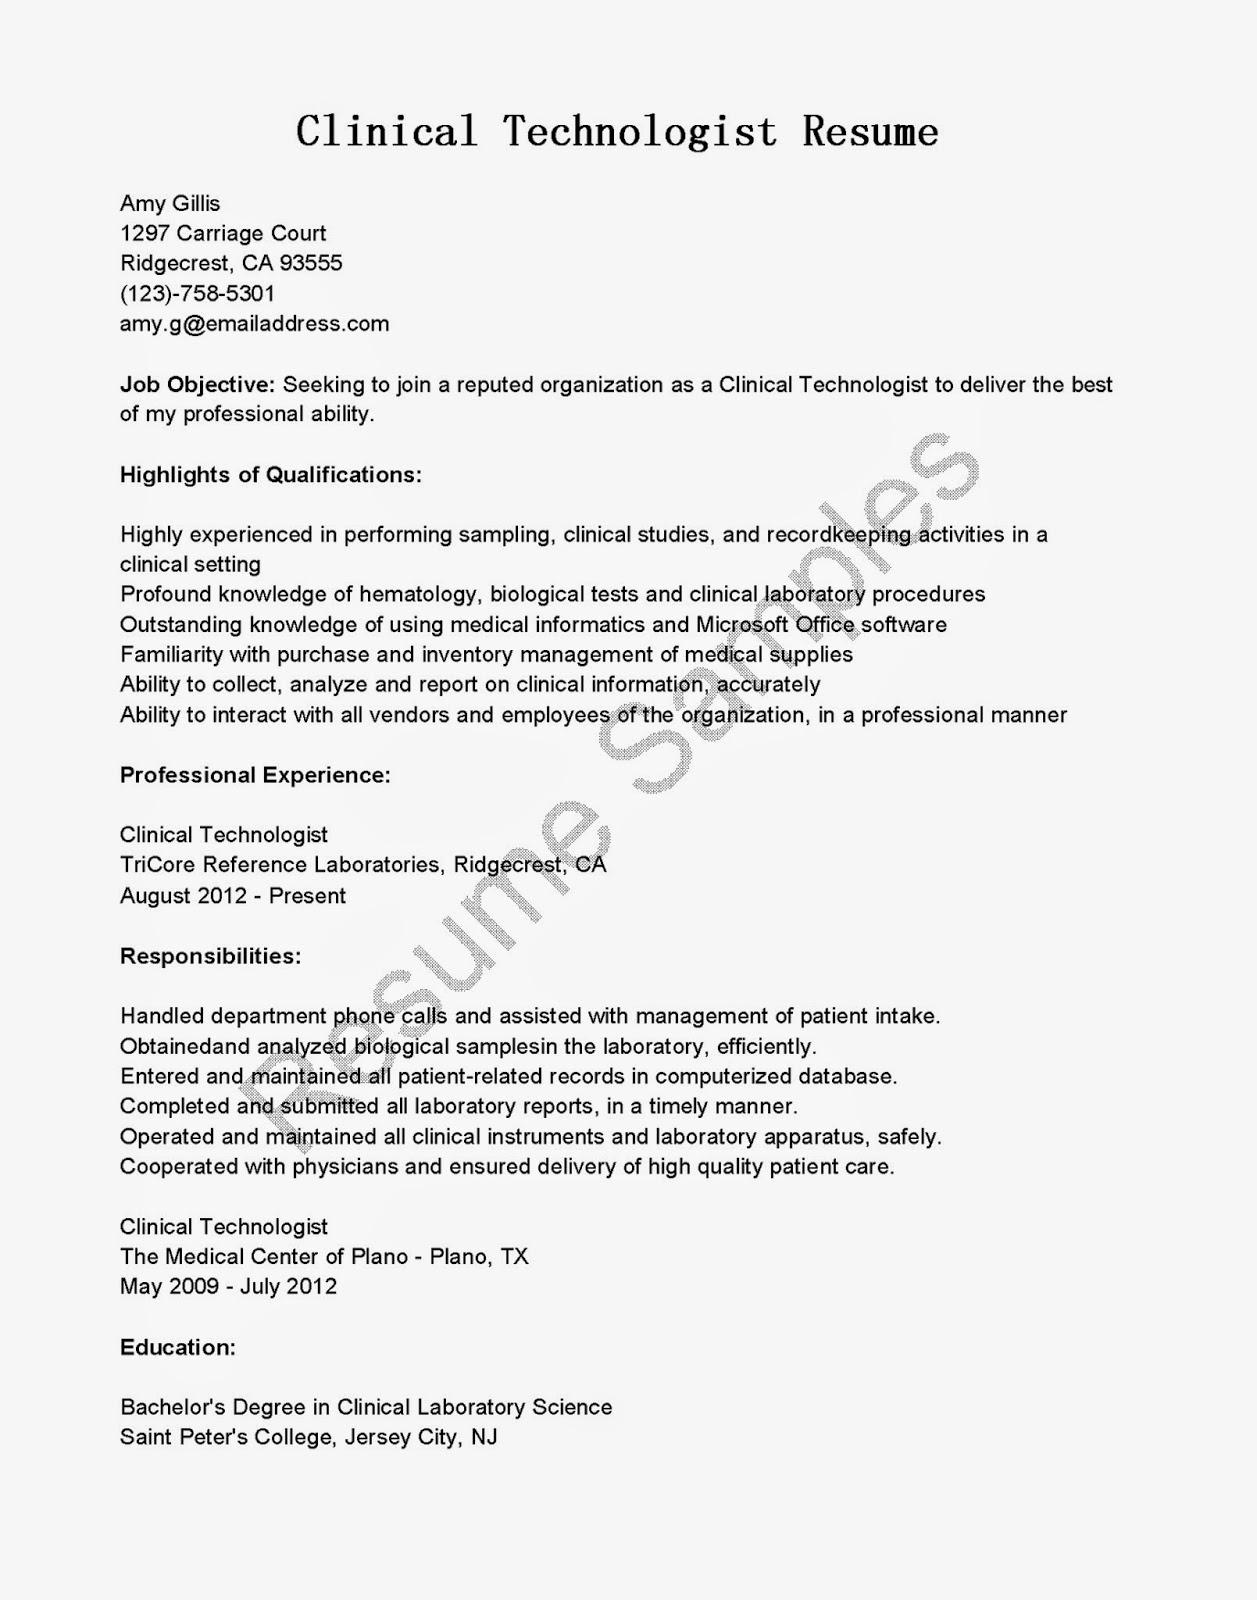 Resume Samples Clinical Technologist Resume Sample